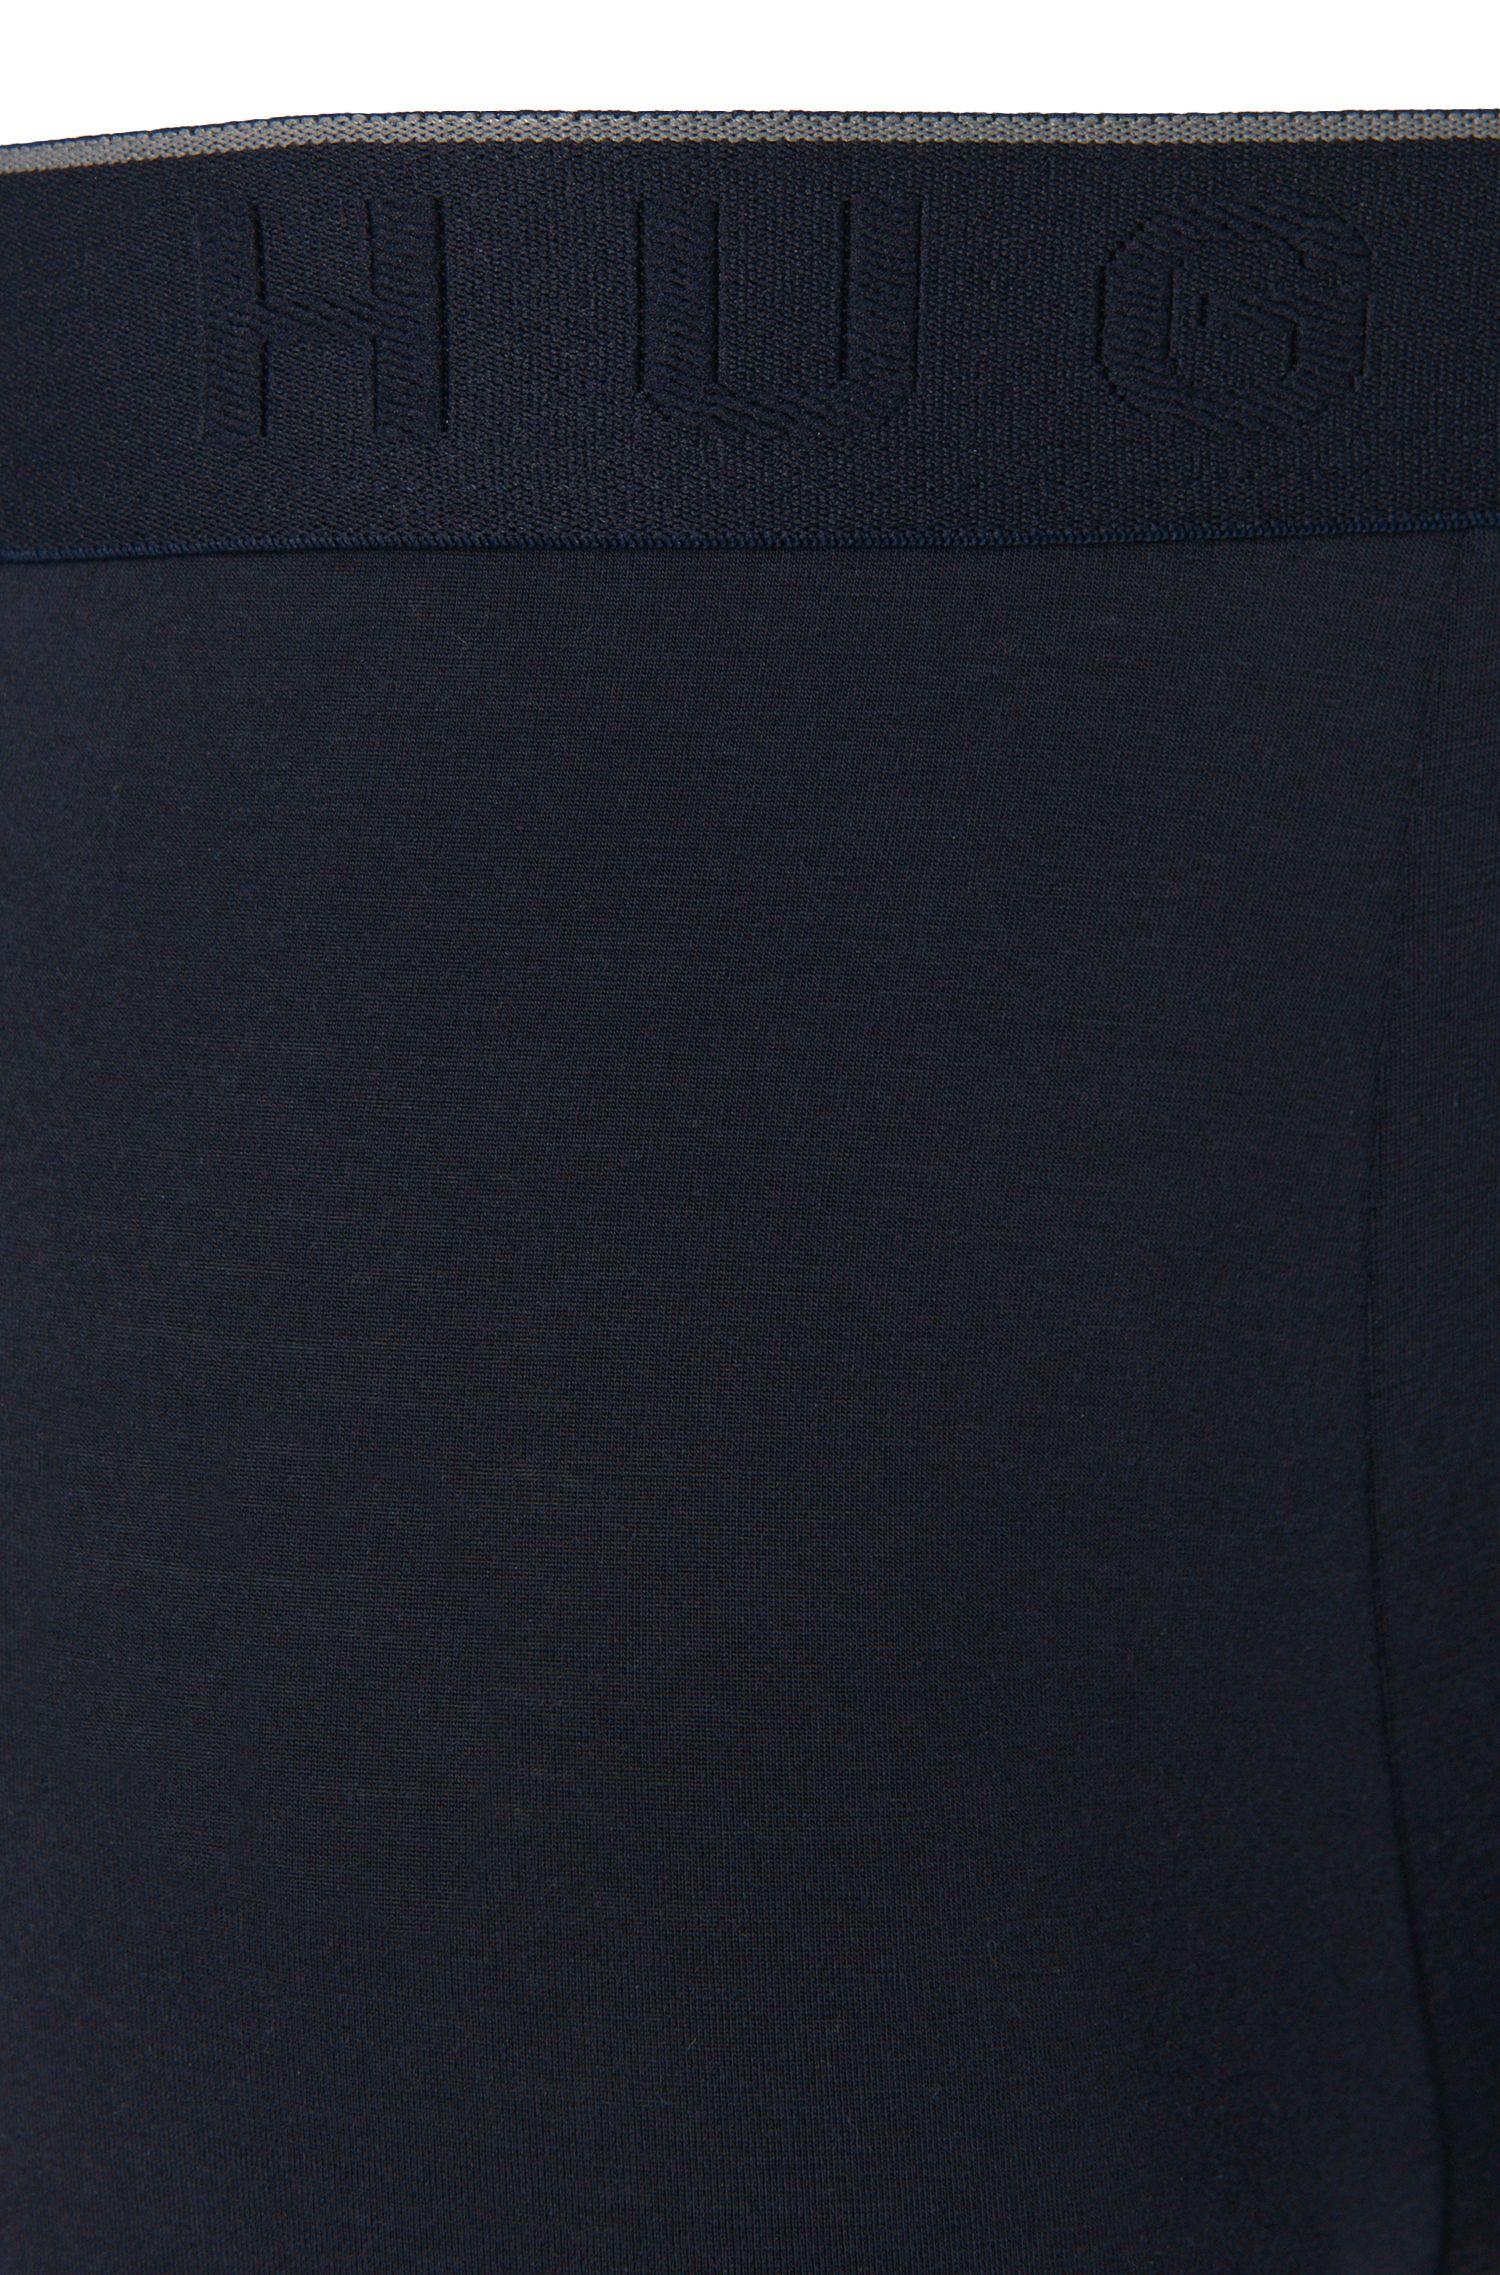 Stretch Modal Lyocell Trunk | Boxer Seacell, Dark Blue